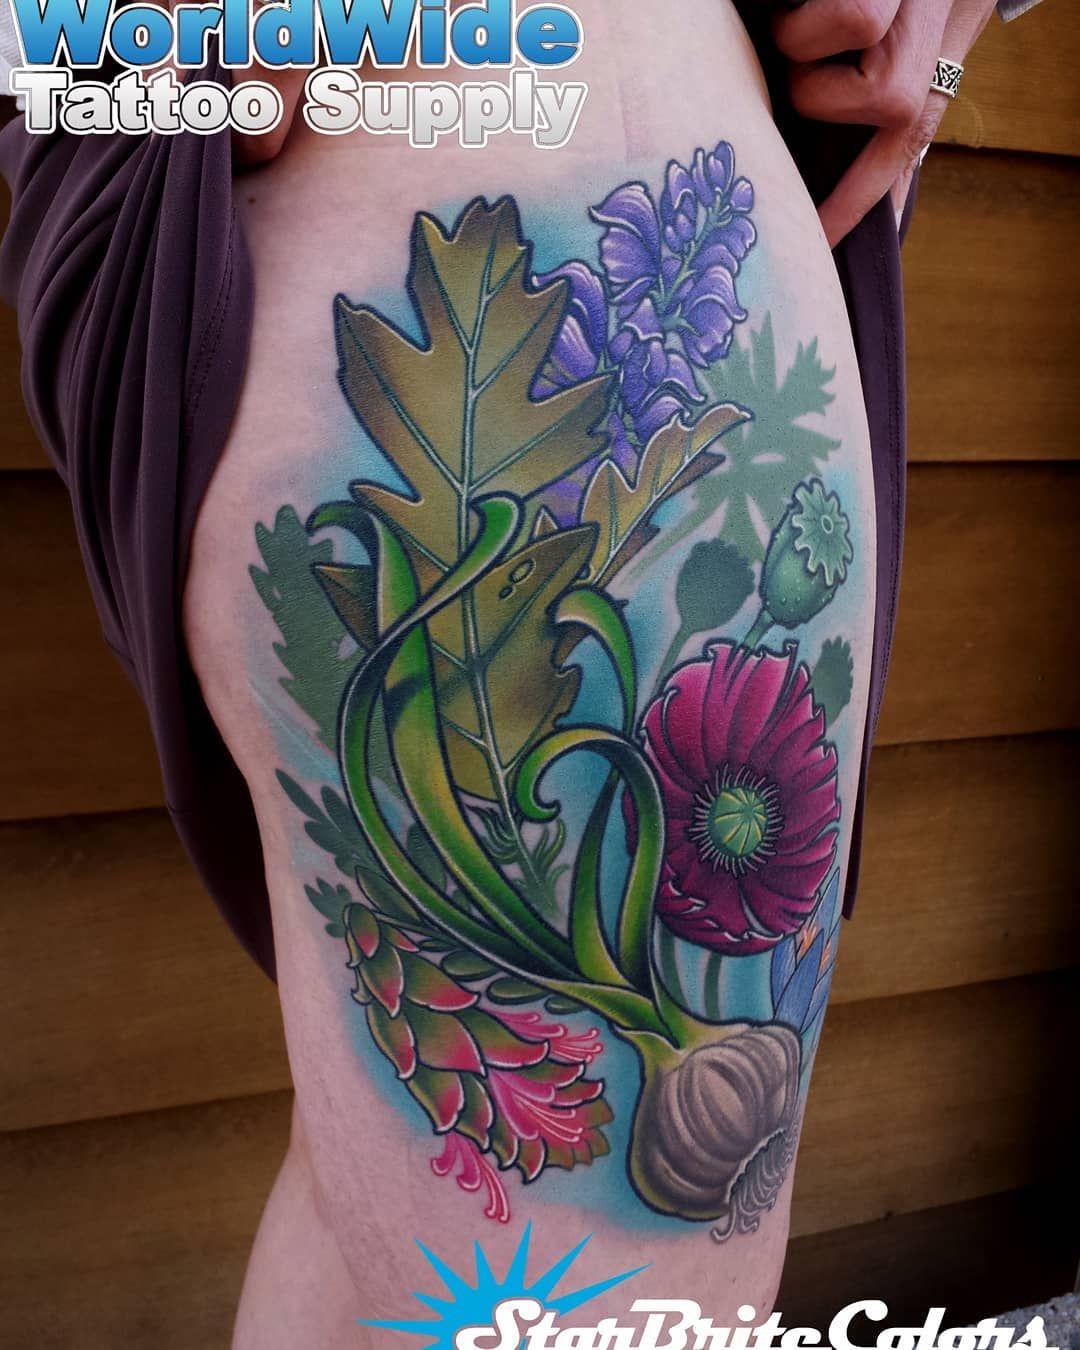 Flower Tattoo On Thigh With A Garlic Bulb By Ct Tattoo Artist